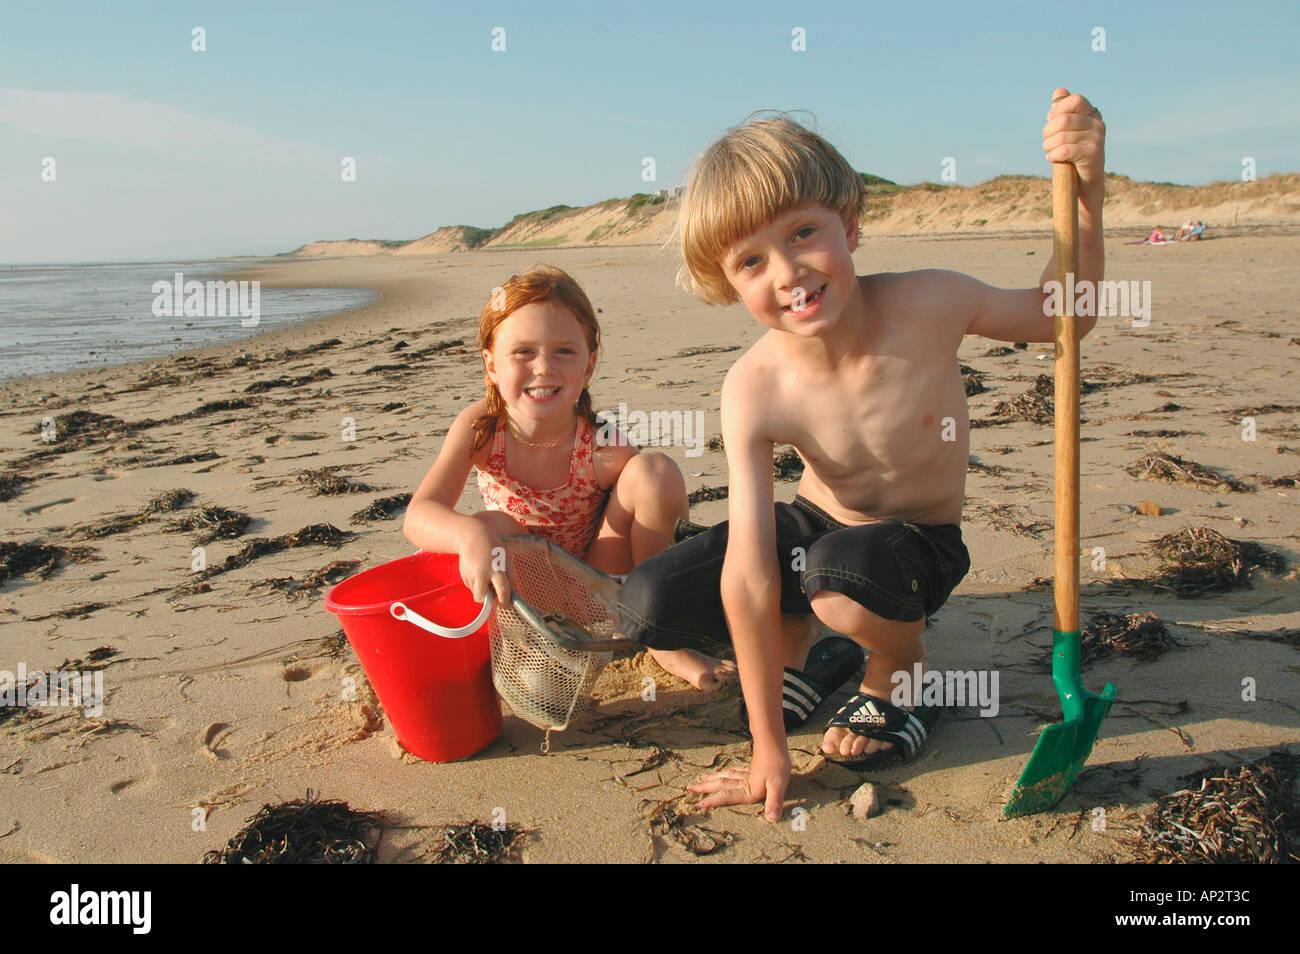 Marvelous Cape Cod Kids Part - 9: Kids Playing On New England Cape Cod Beach Wellfleet, MA, Massachusetts, USA